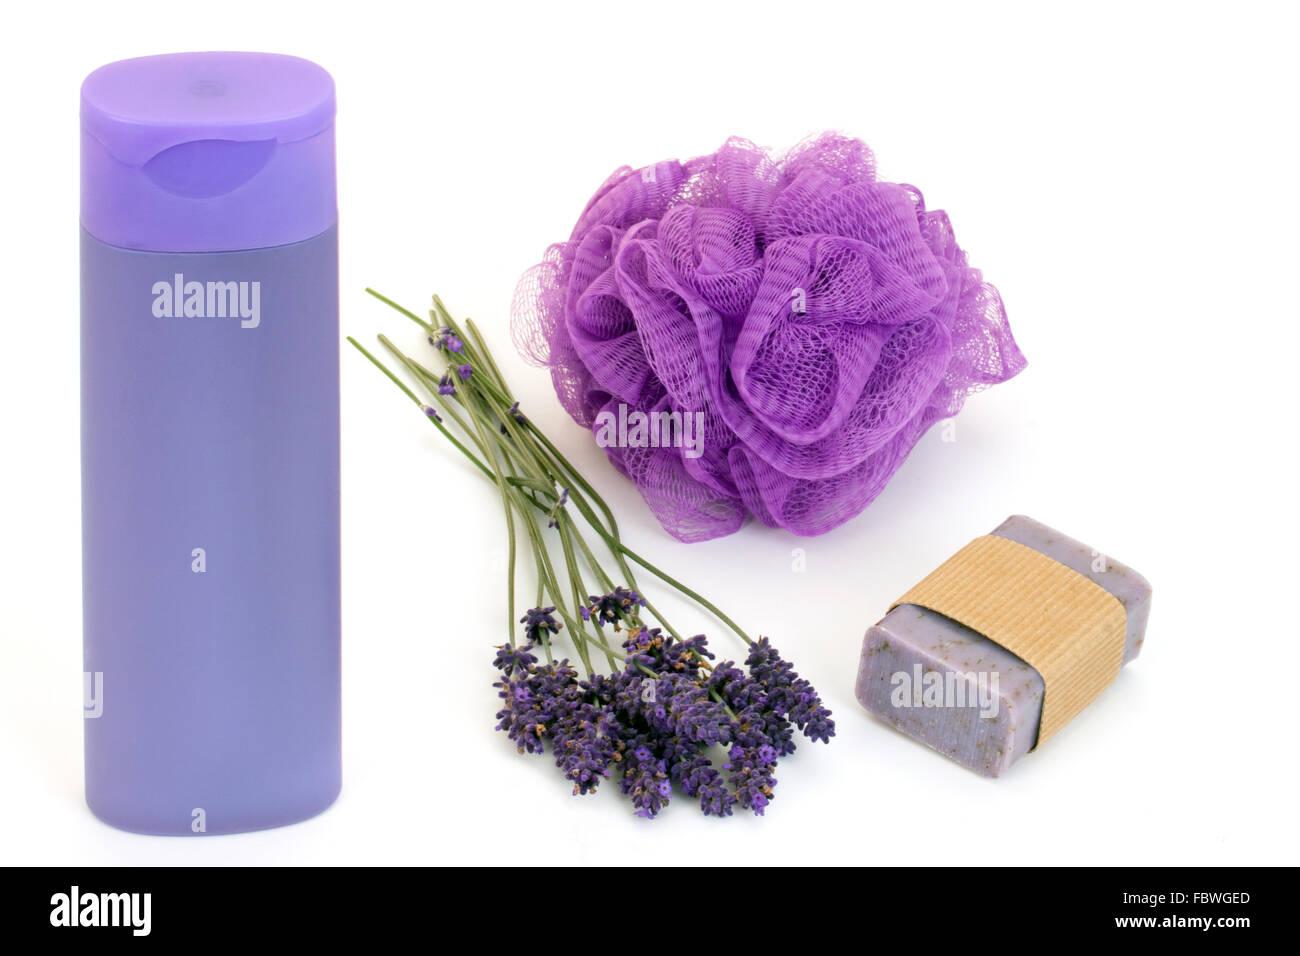 Shower gel with sponge - Stock Image